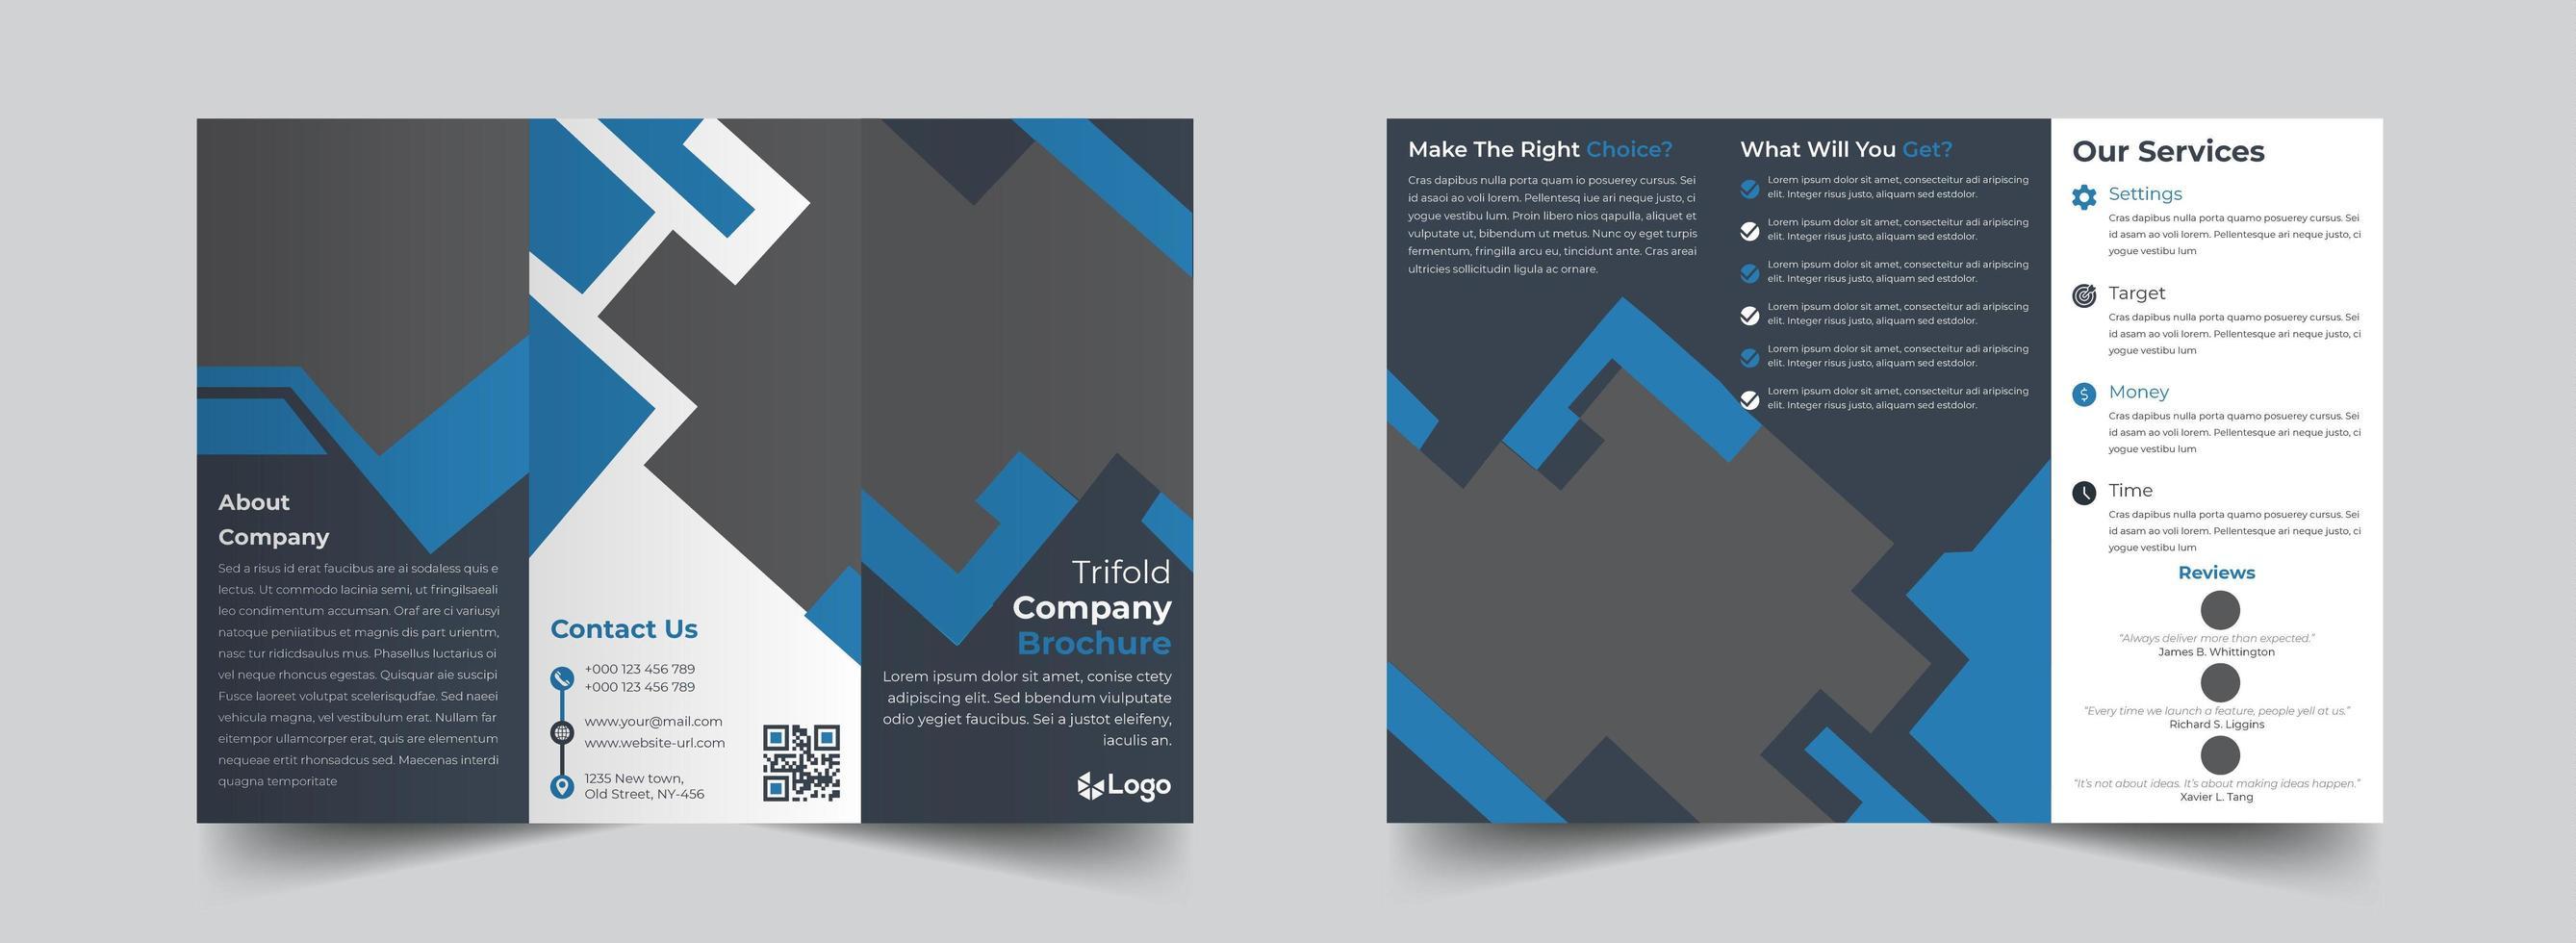 Corporate trifold brochure design template vector